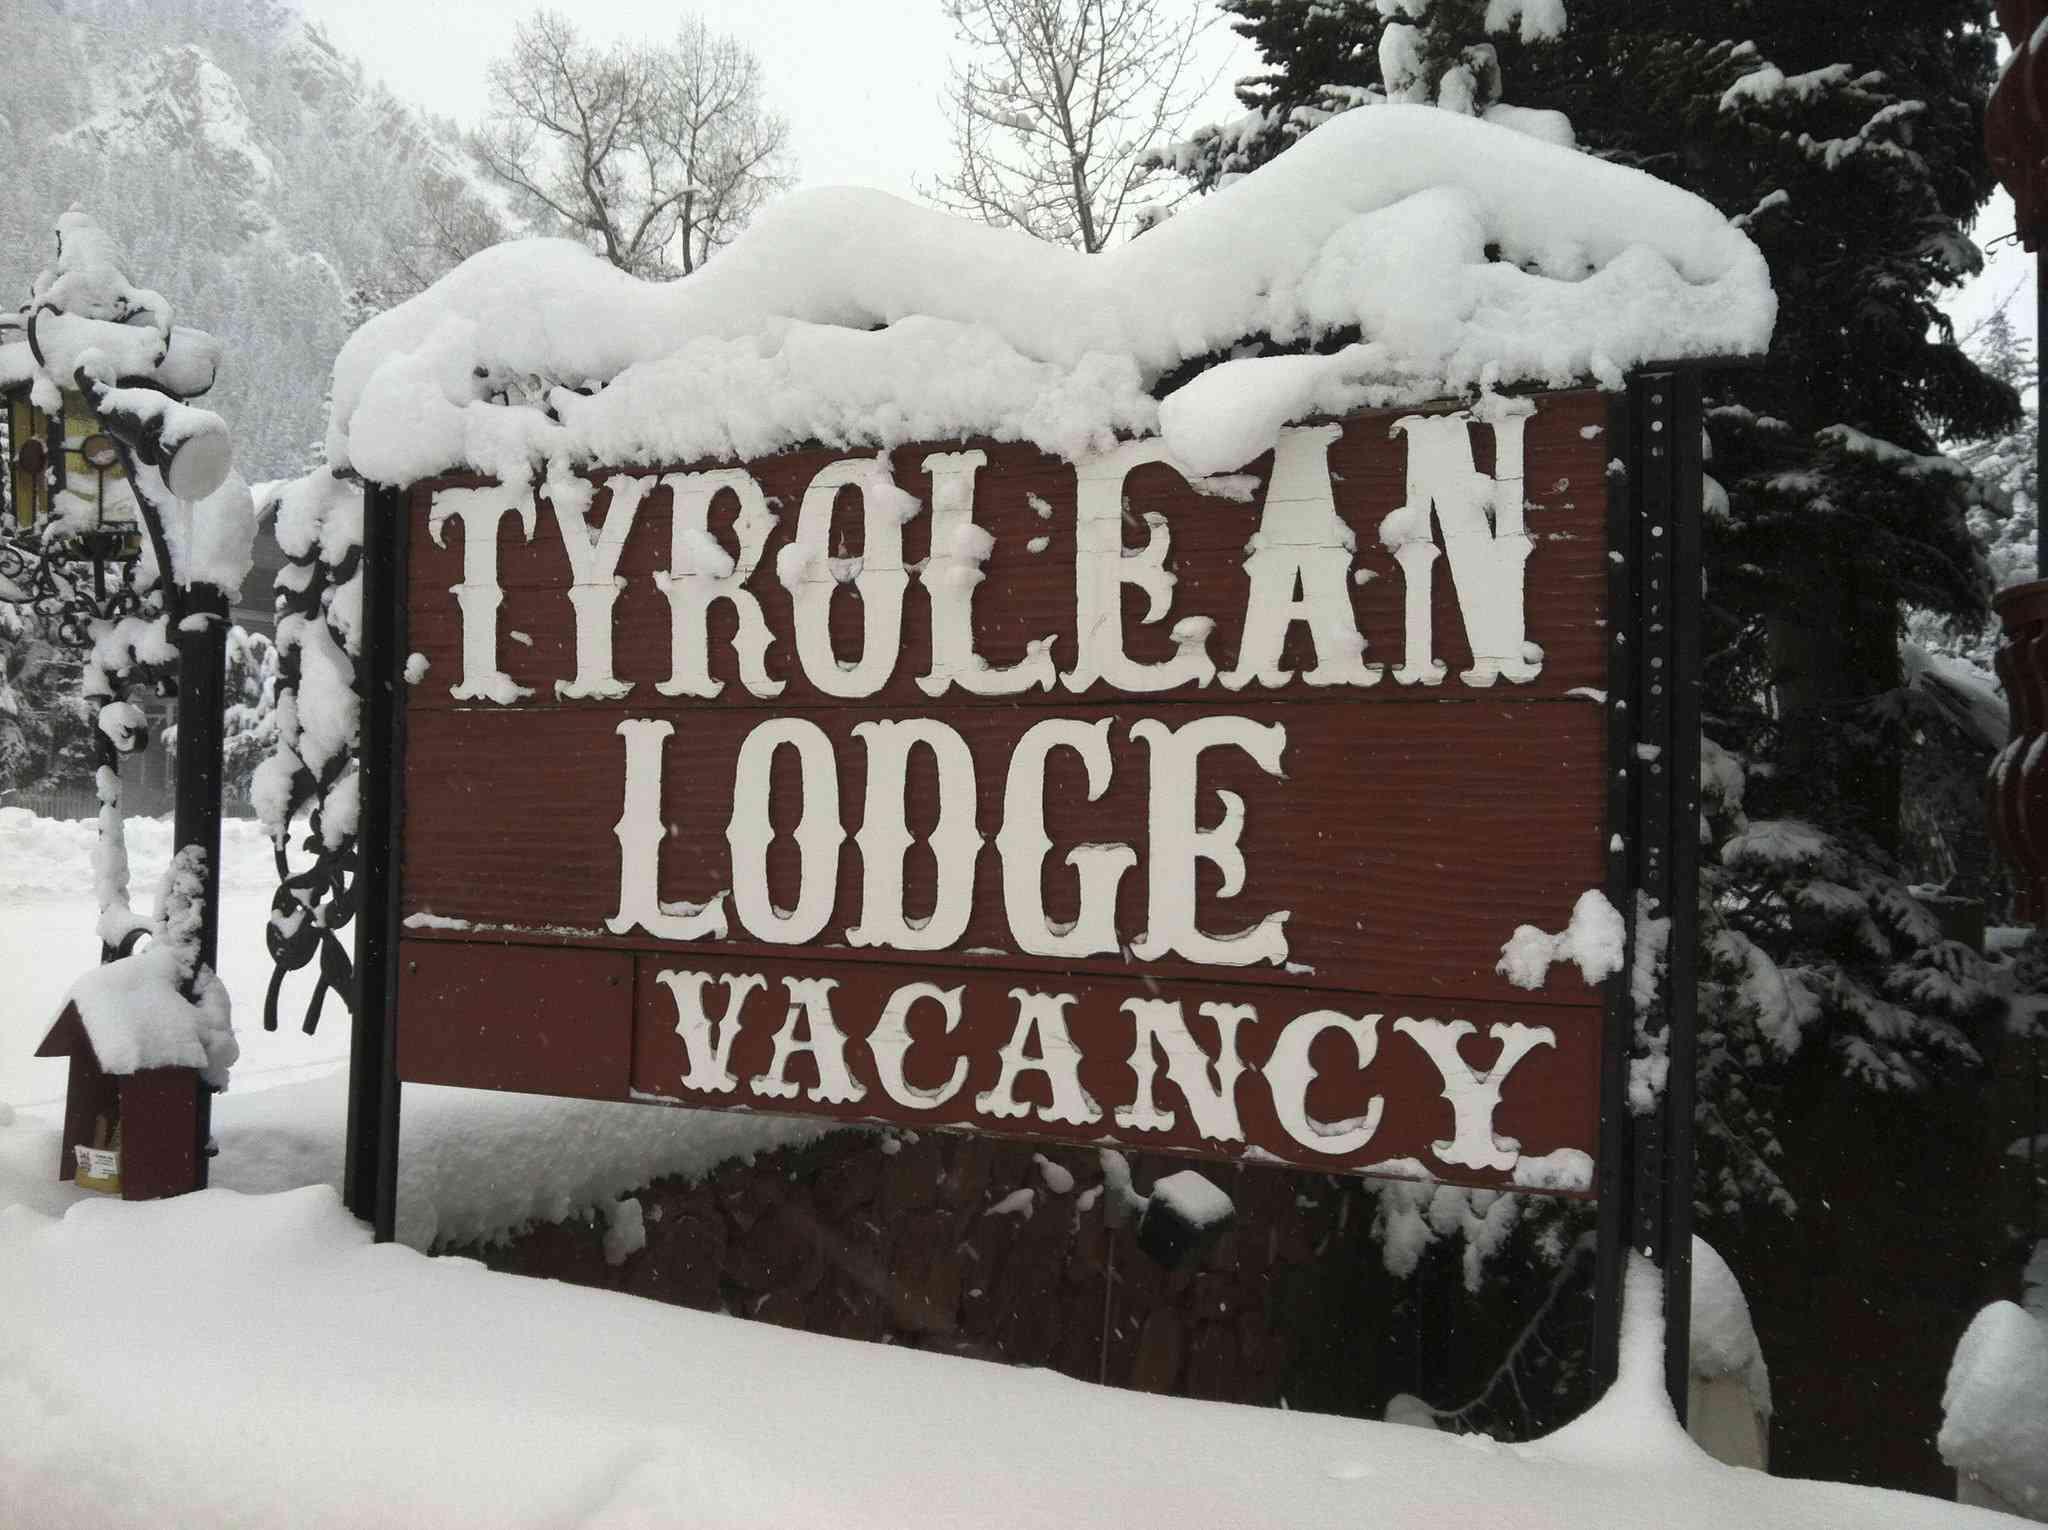 Tyrolean Lodge